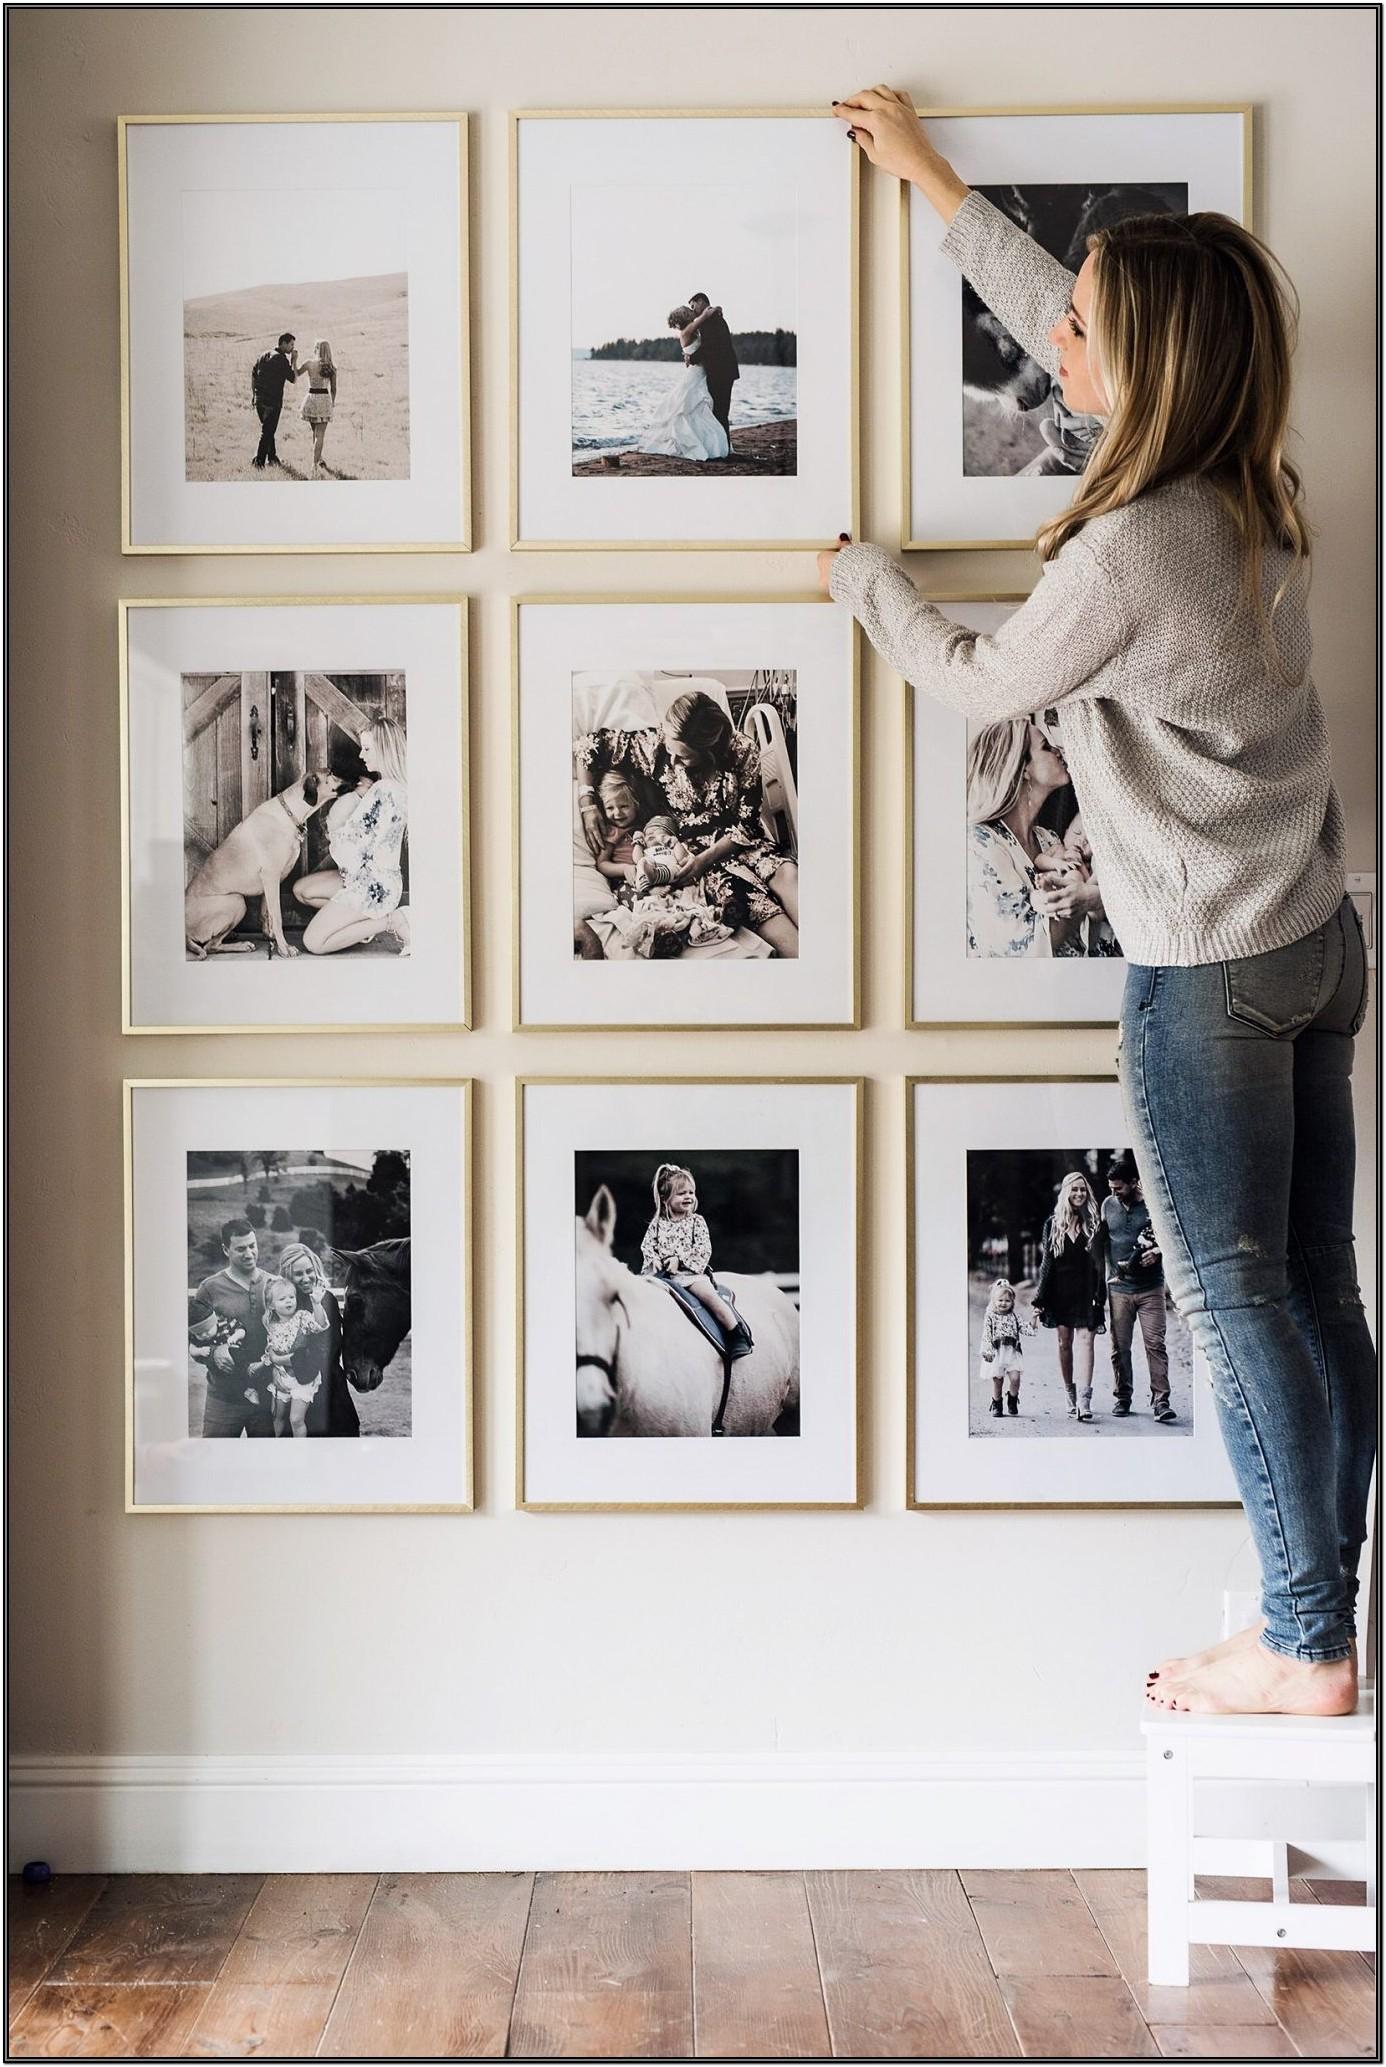 Living Room Wall Frame Decor Ideas